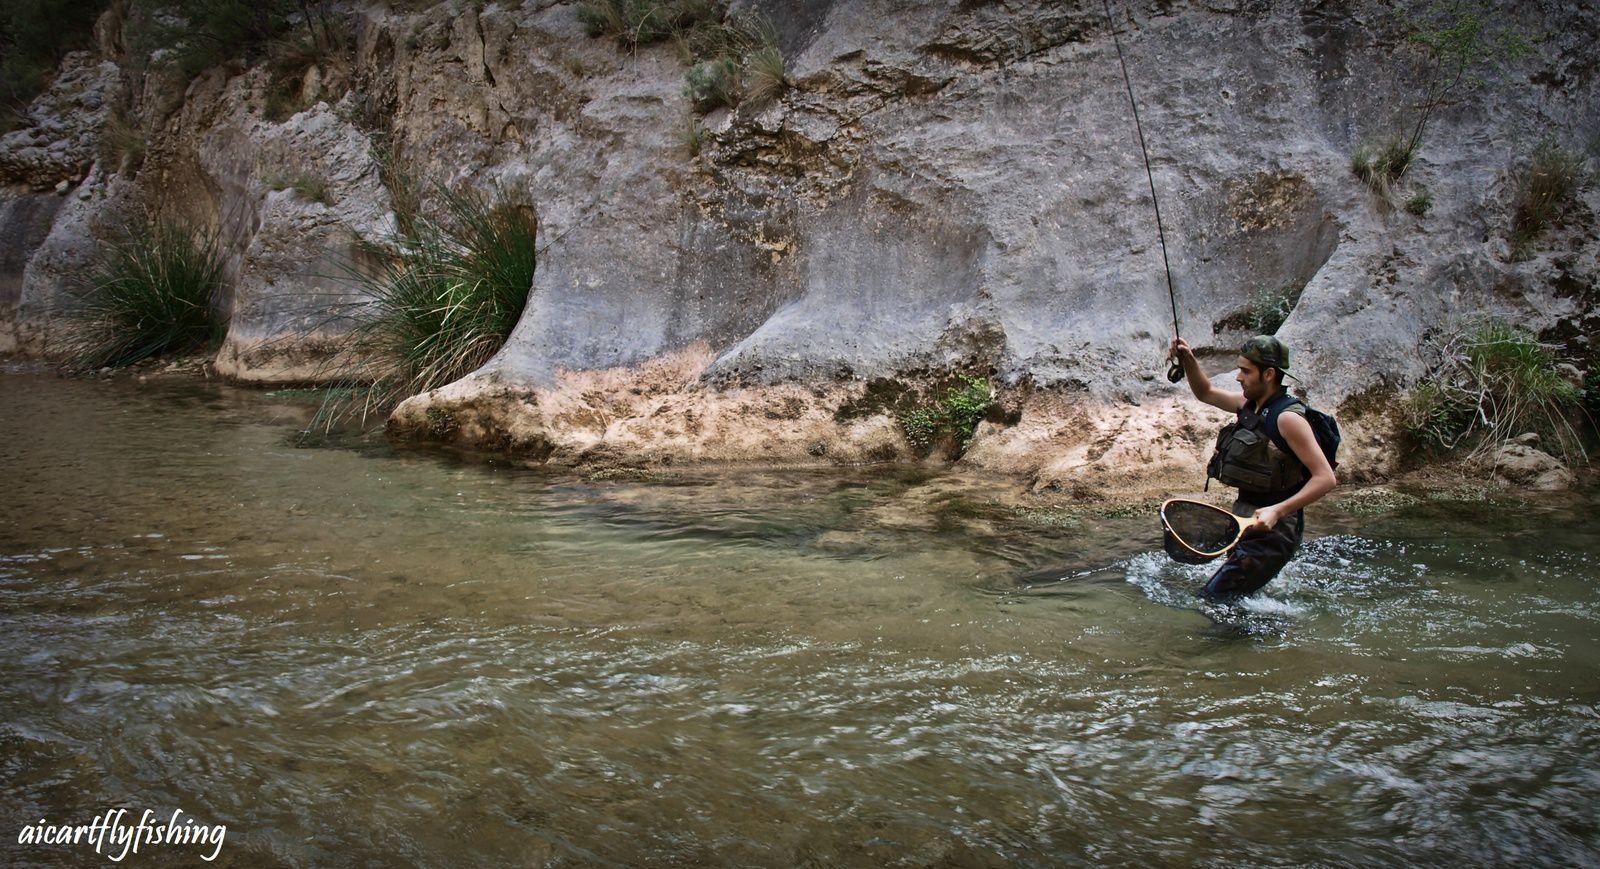 Trucha enloquecida que me hizo bajar un buen trozo río a bajo. - Crazy trout  make me run downstream.